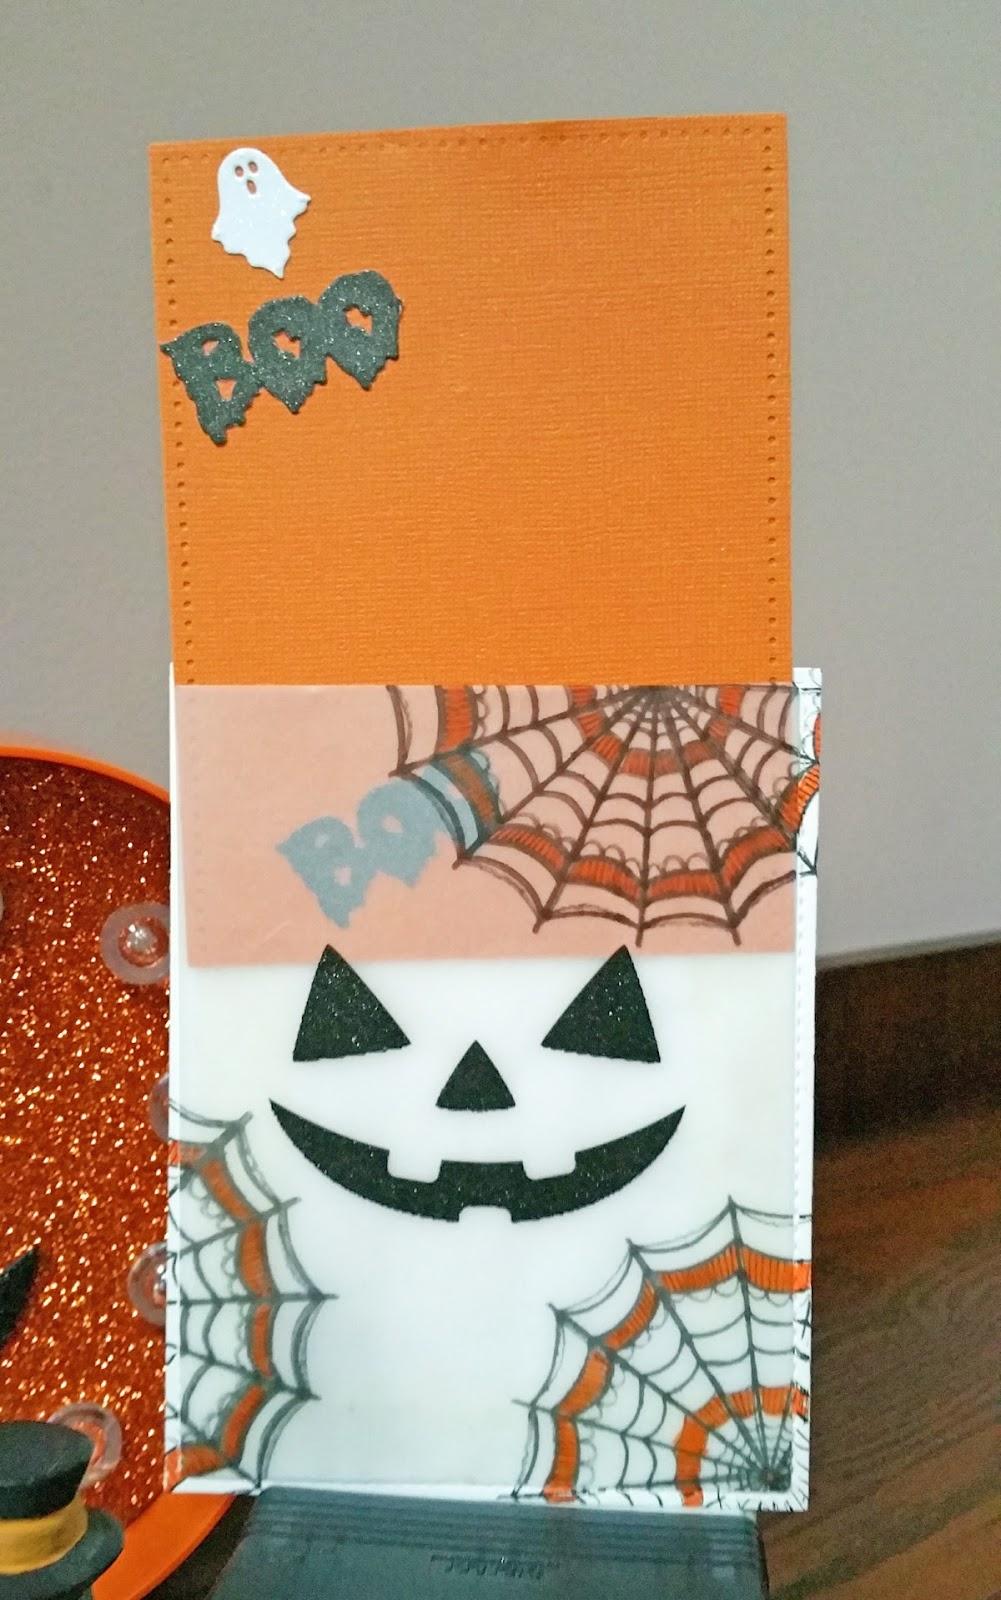 come craft w/me : halloween card 3 - jack-o-lantern envelope